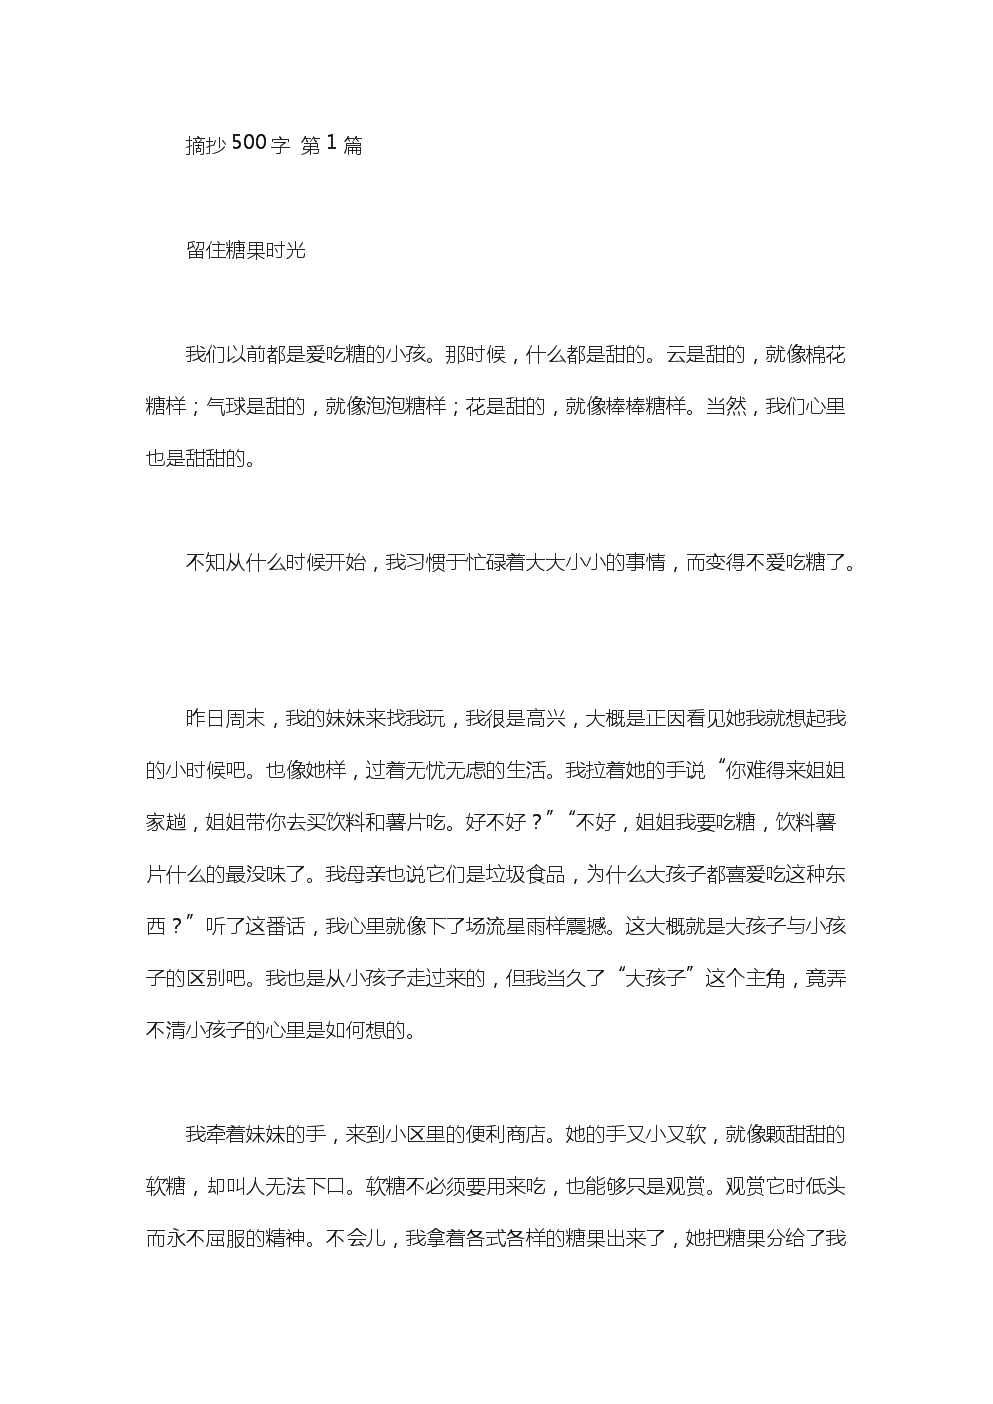 摘抄500字(25篇汇总).doc